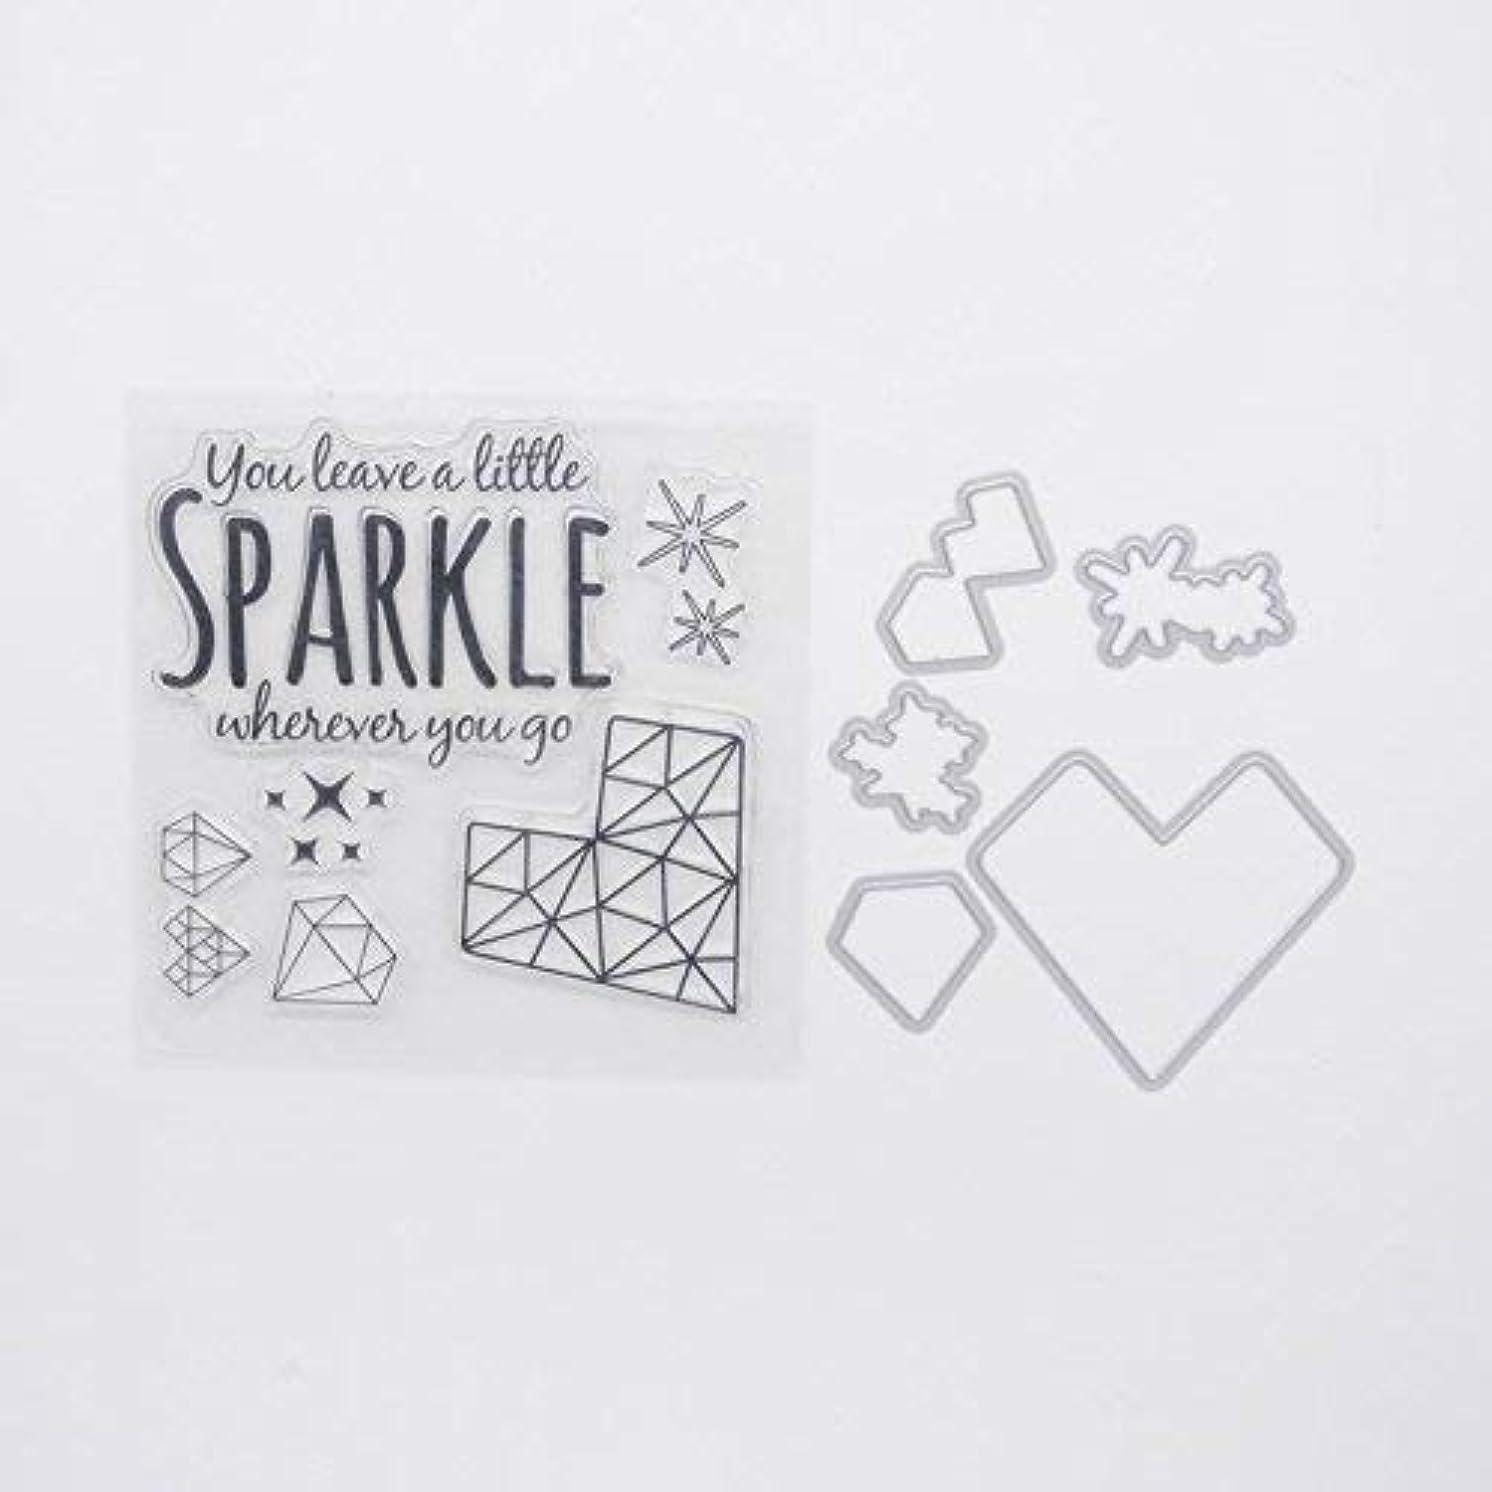 Welcome to Joyful Home Sparkle Metal Cutting Dies Stamp Stencils DIY Scrapbooking Photo Album Decor Cards (Clear Stamp+Dies Cutting)